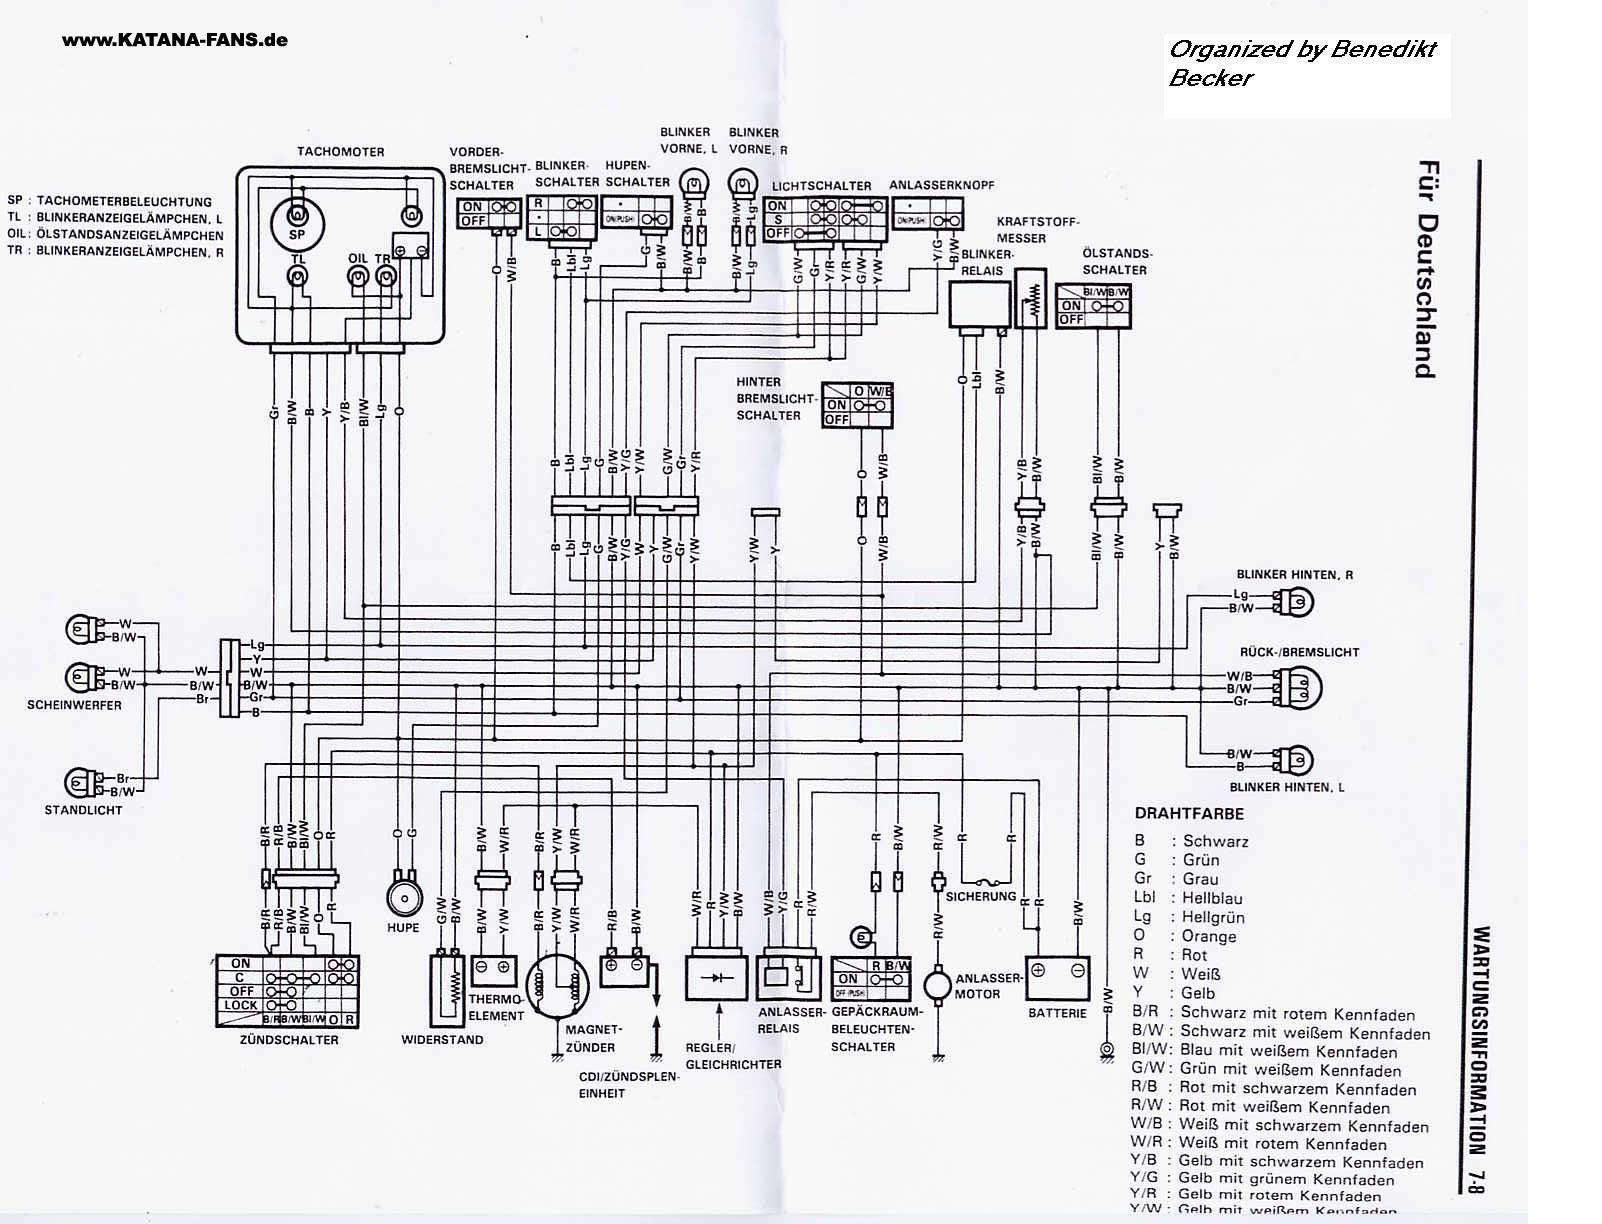 Poszukuj U0119 Schematu Elektryki Skutera Peugeot Speedfight